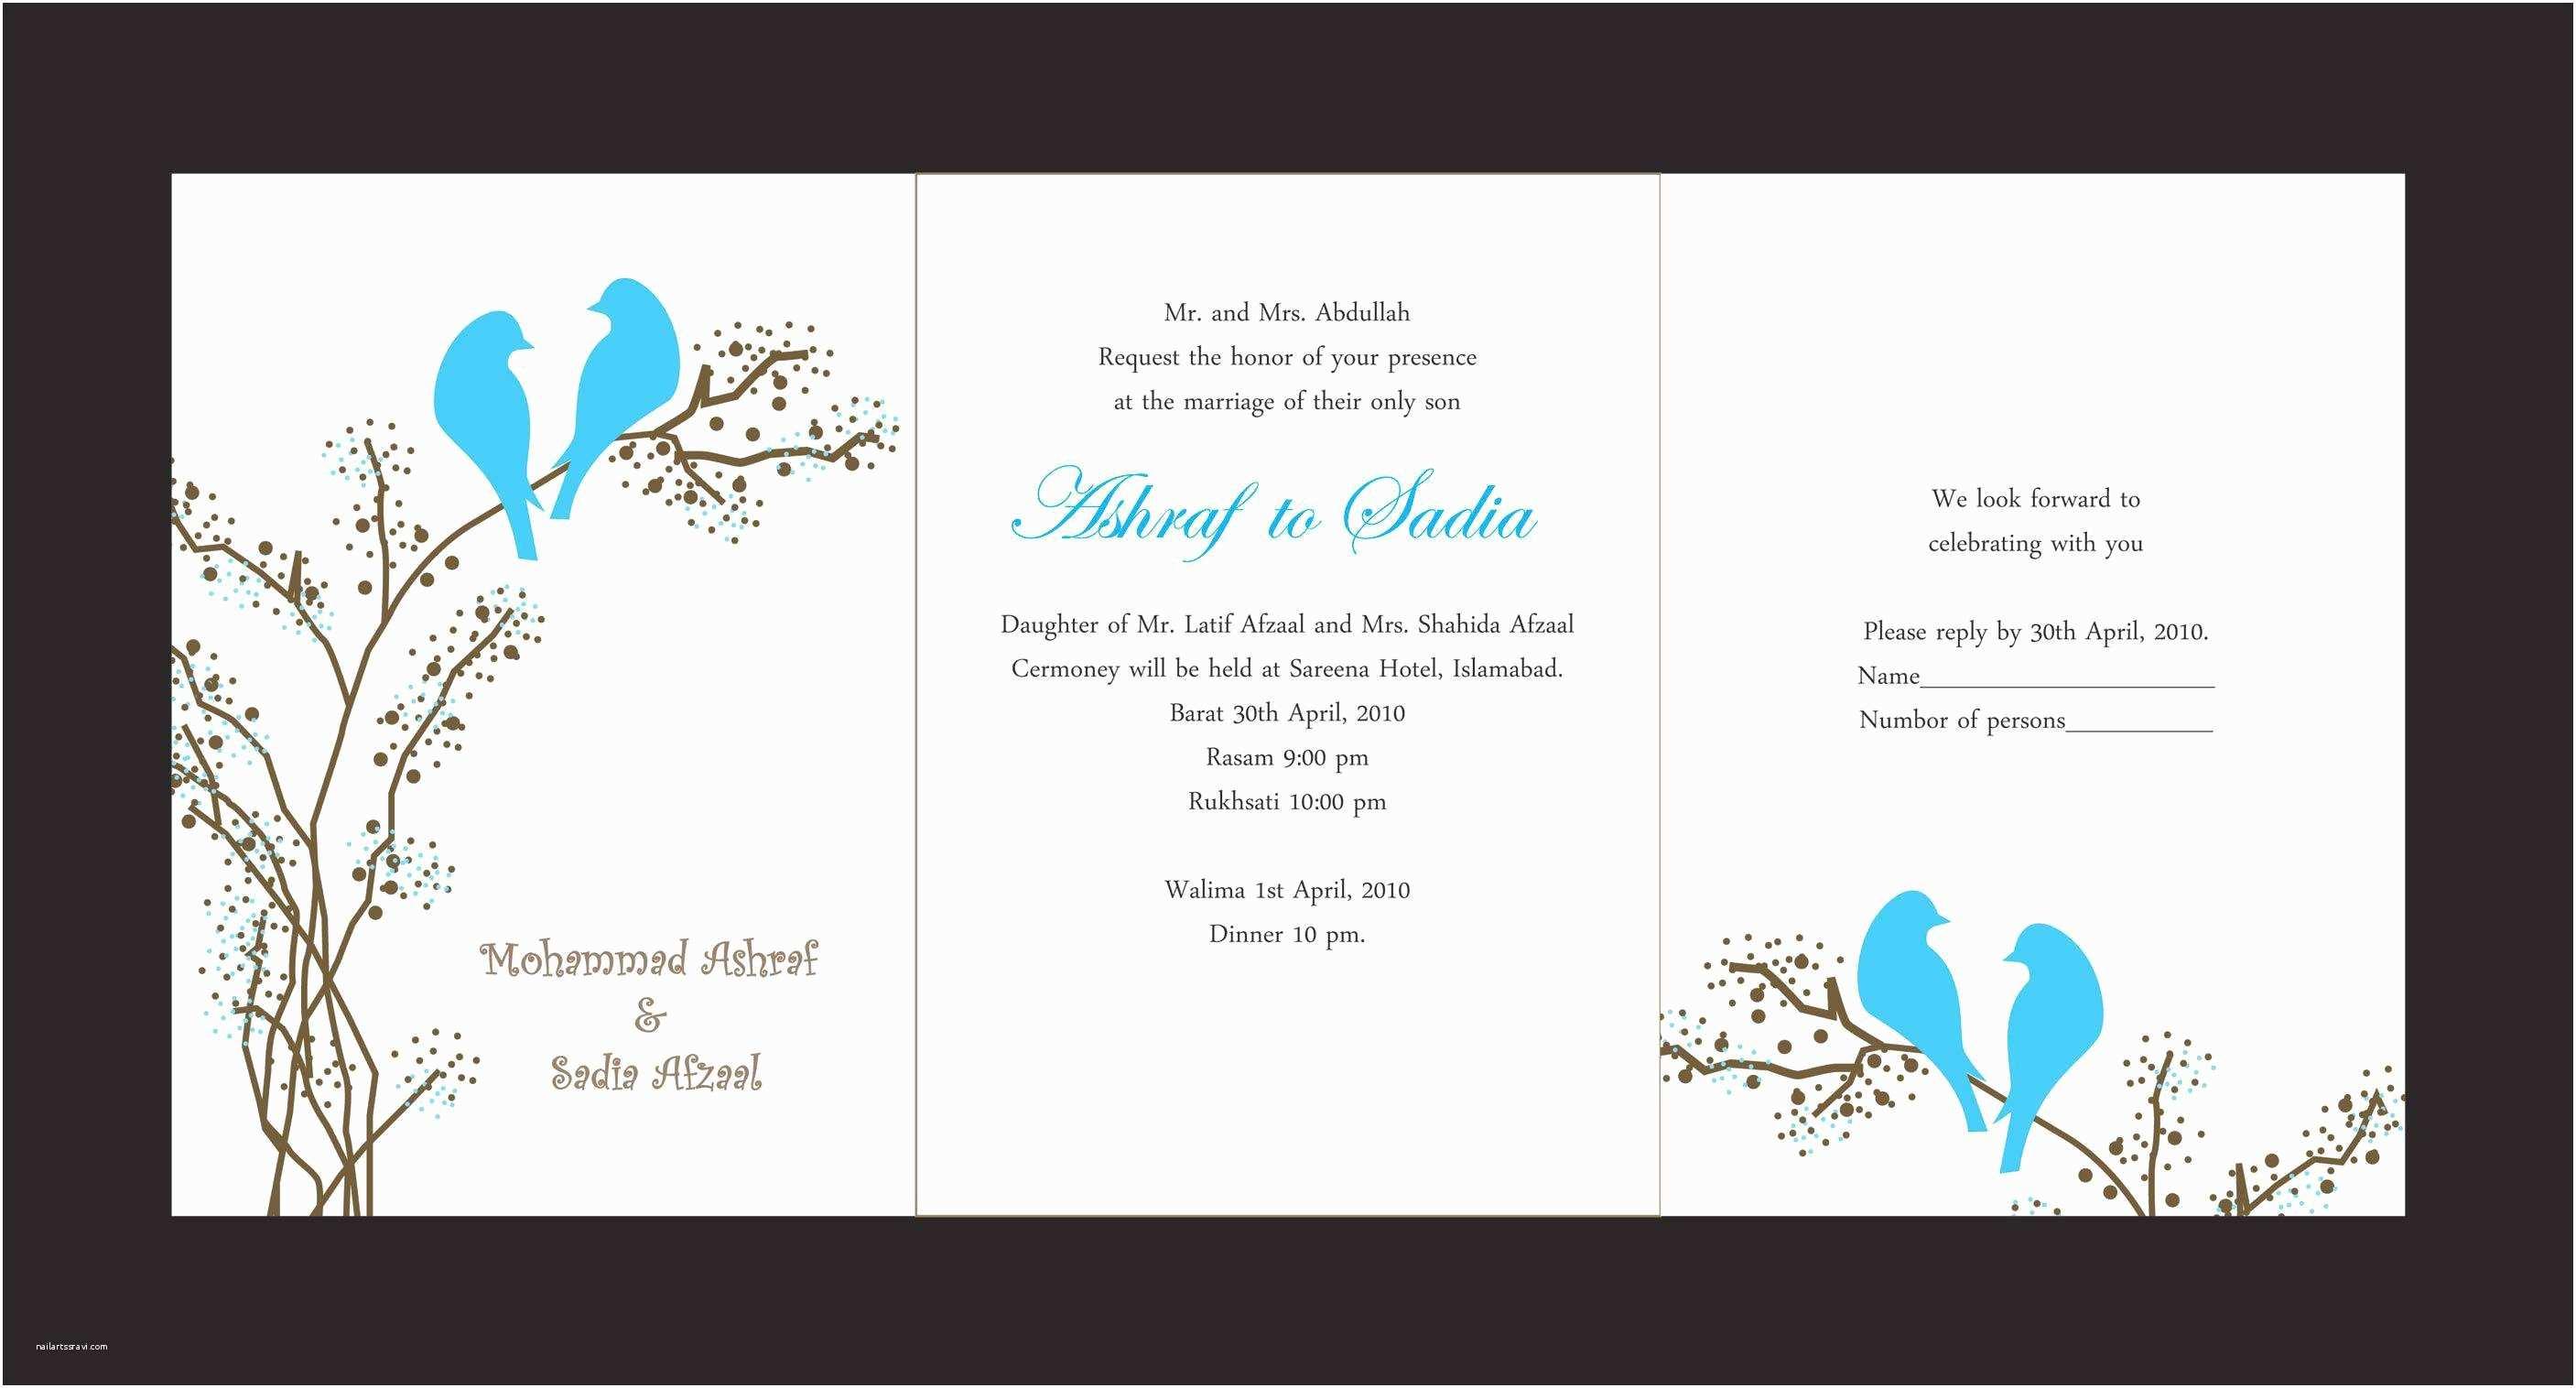 Online Wedding Invitation Maker Line Invitation Templates Line Invitation Maker with